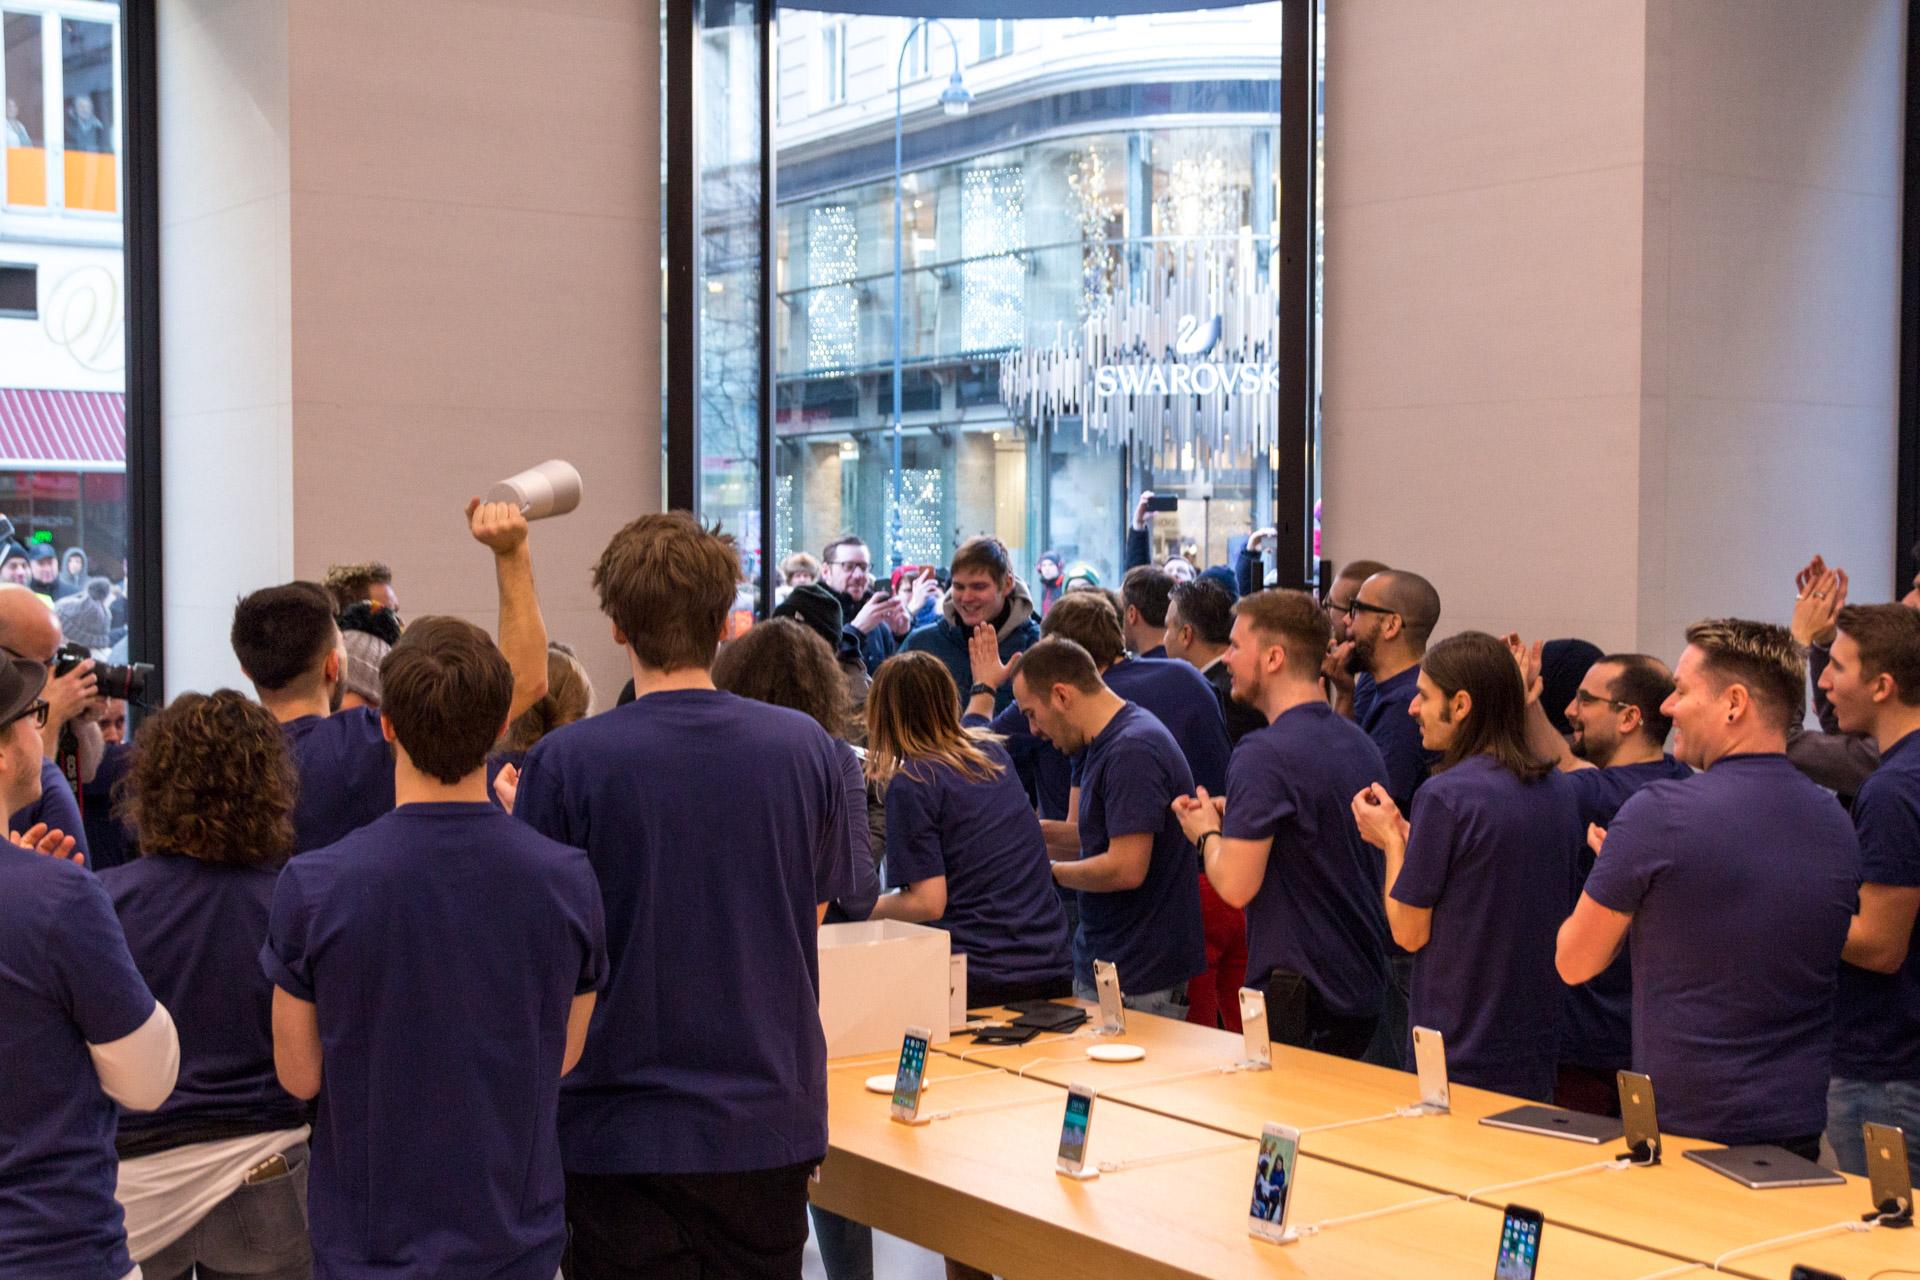 Abhilfe mit neuem Lautsprecher, Apple Store Kärntnerstraße, Grand Opening, Hack4Life, Fabian Geissler, Wien